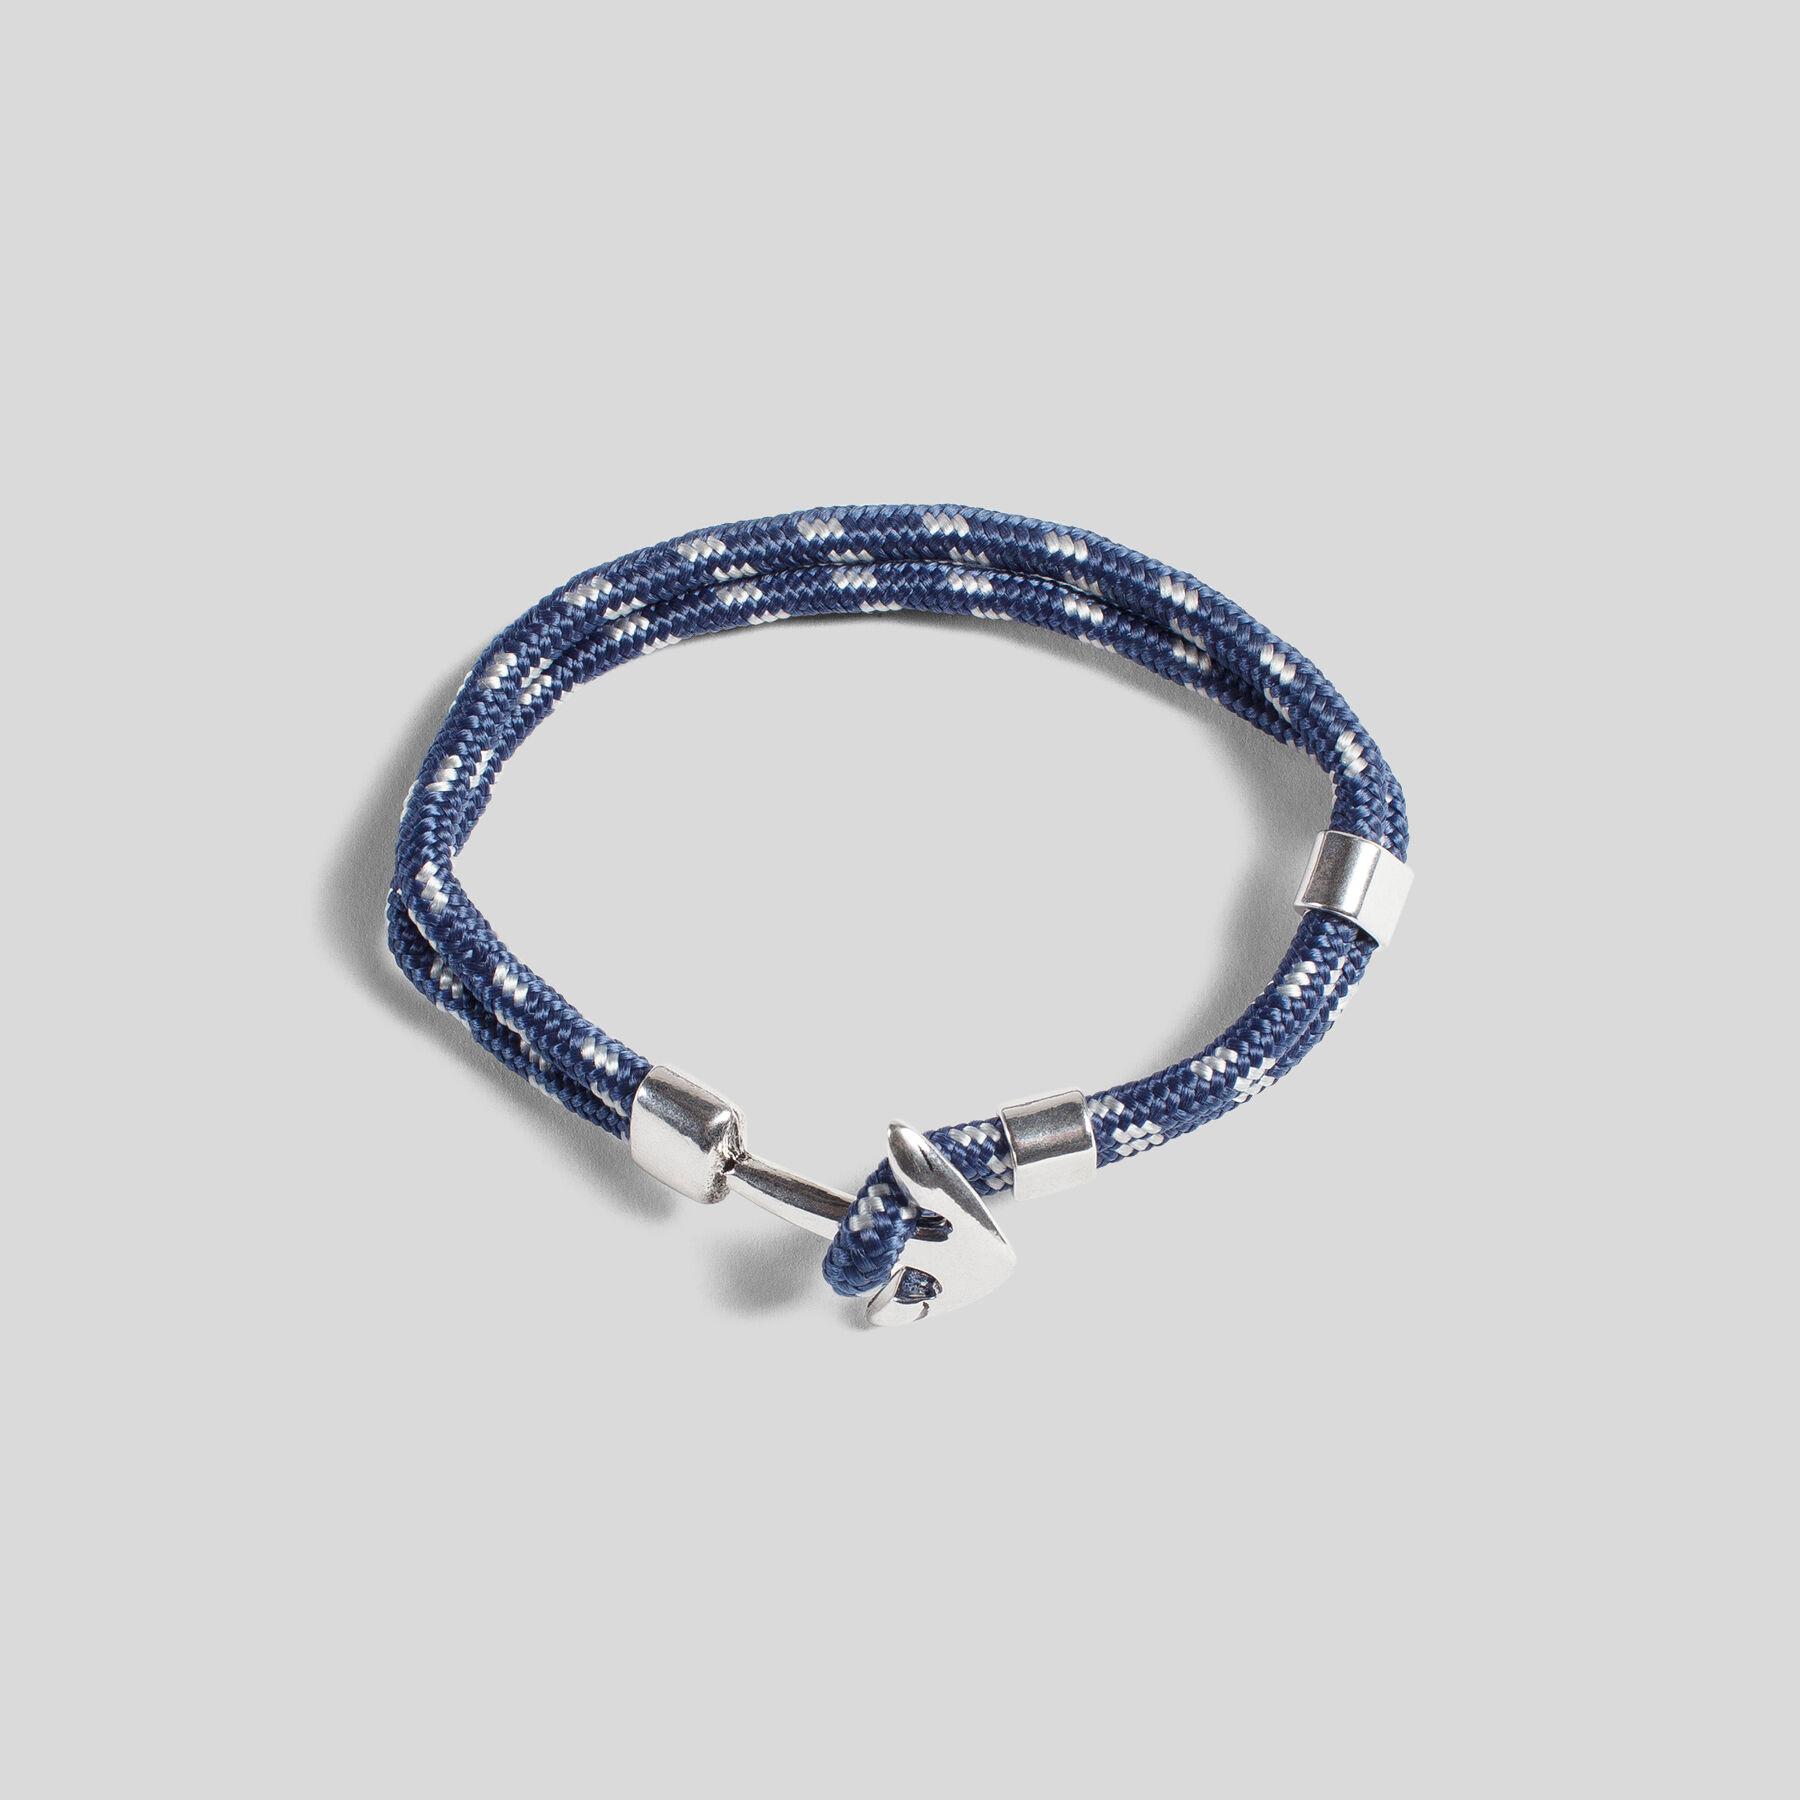 bracelet ancre bleu marine fantaisie homme jules. Black Bedroom Furniture Sets. Home Design Ideas